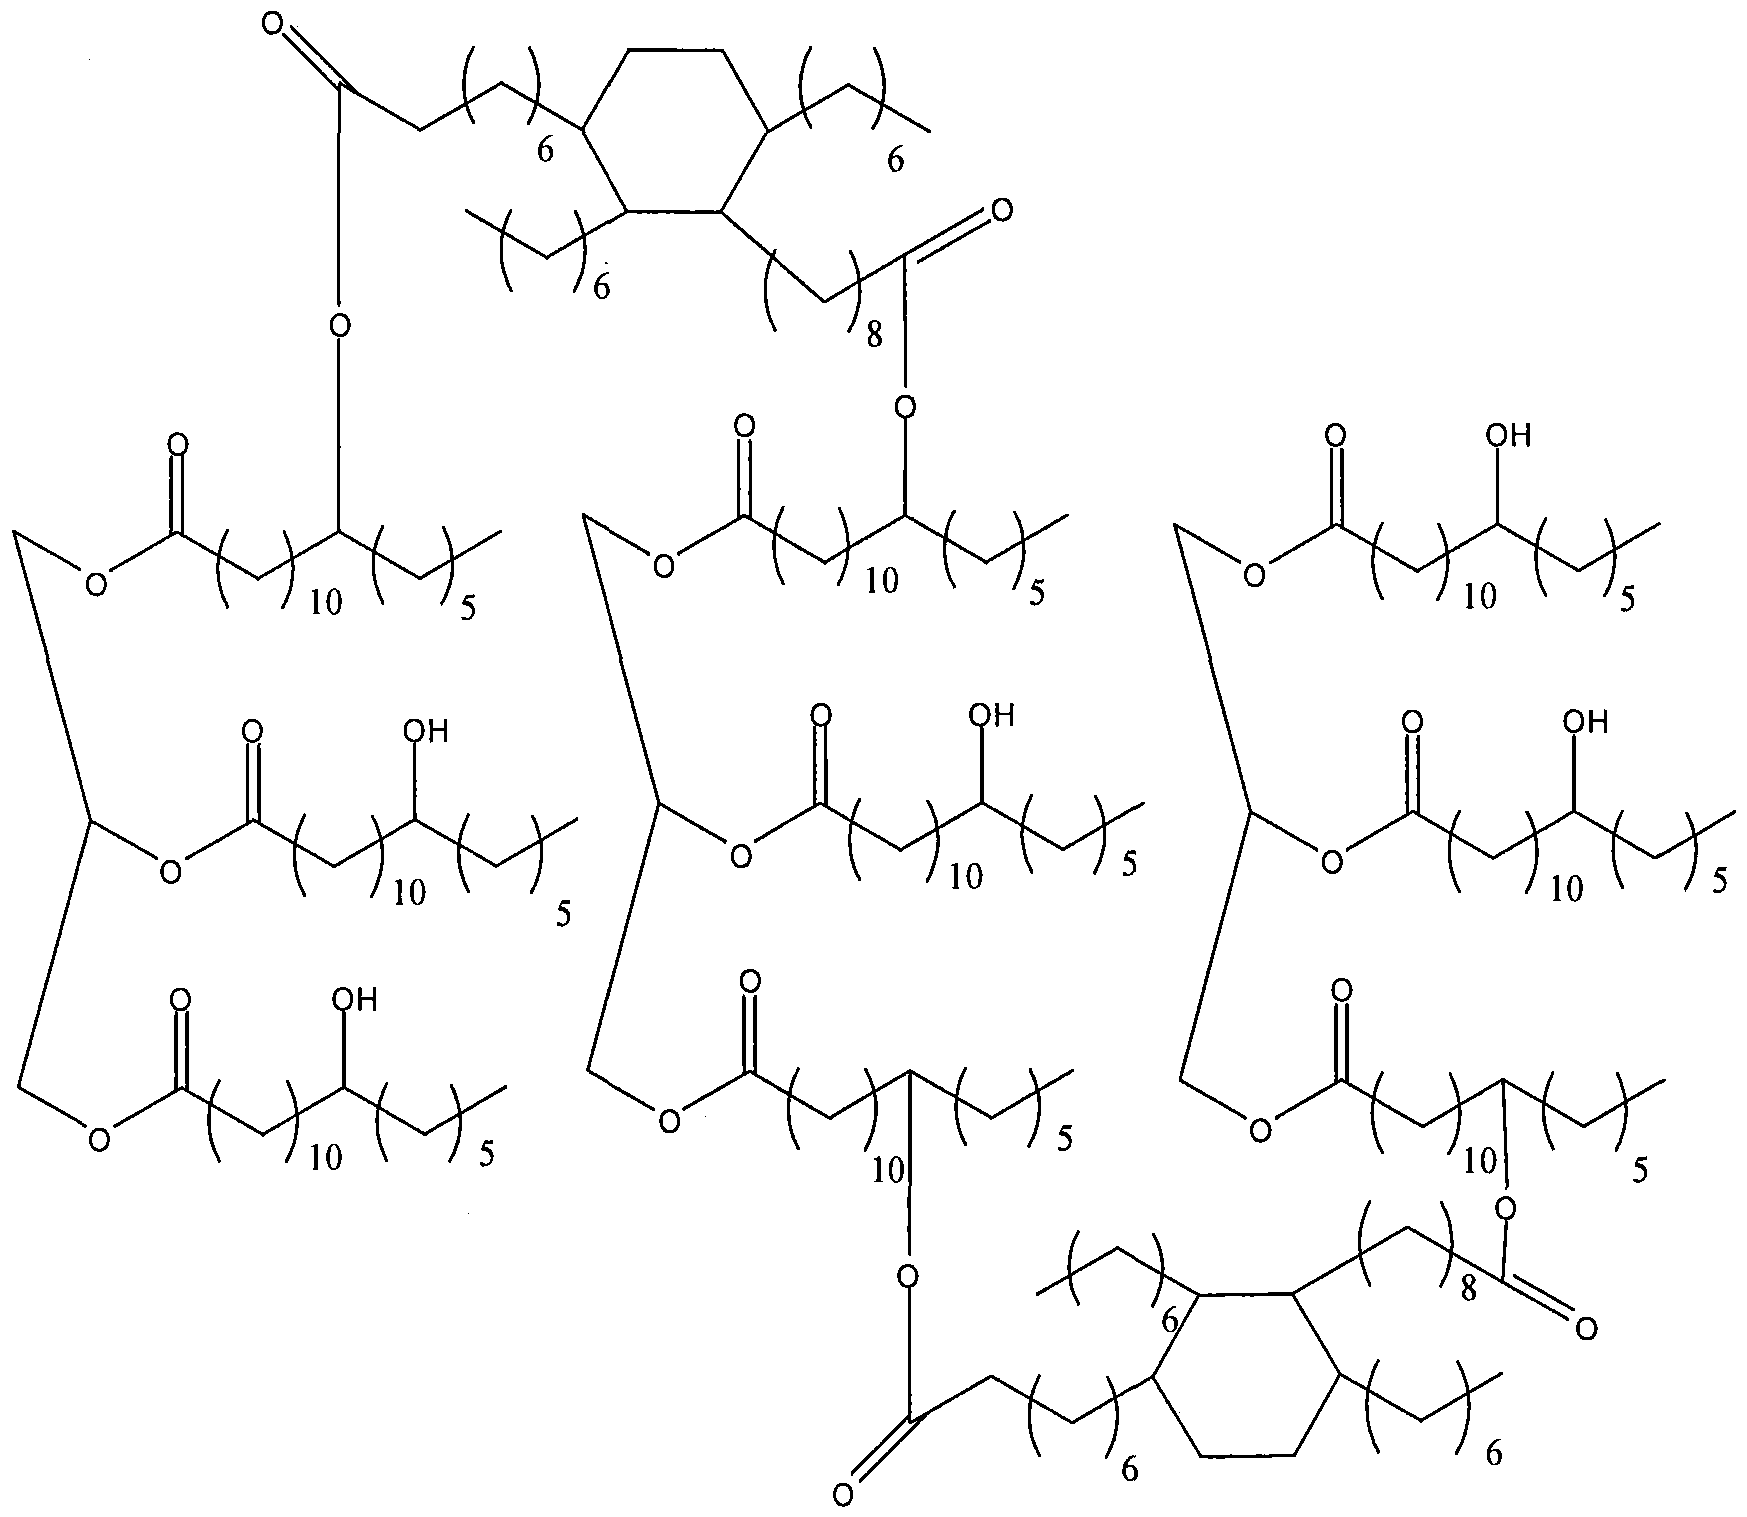 azithromycin powder for sale